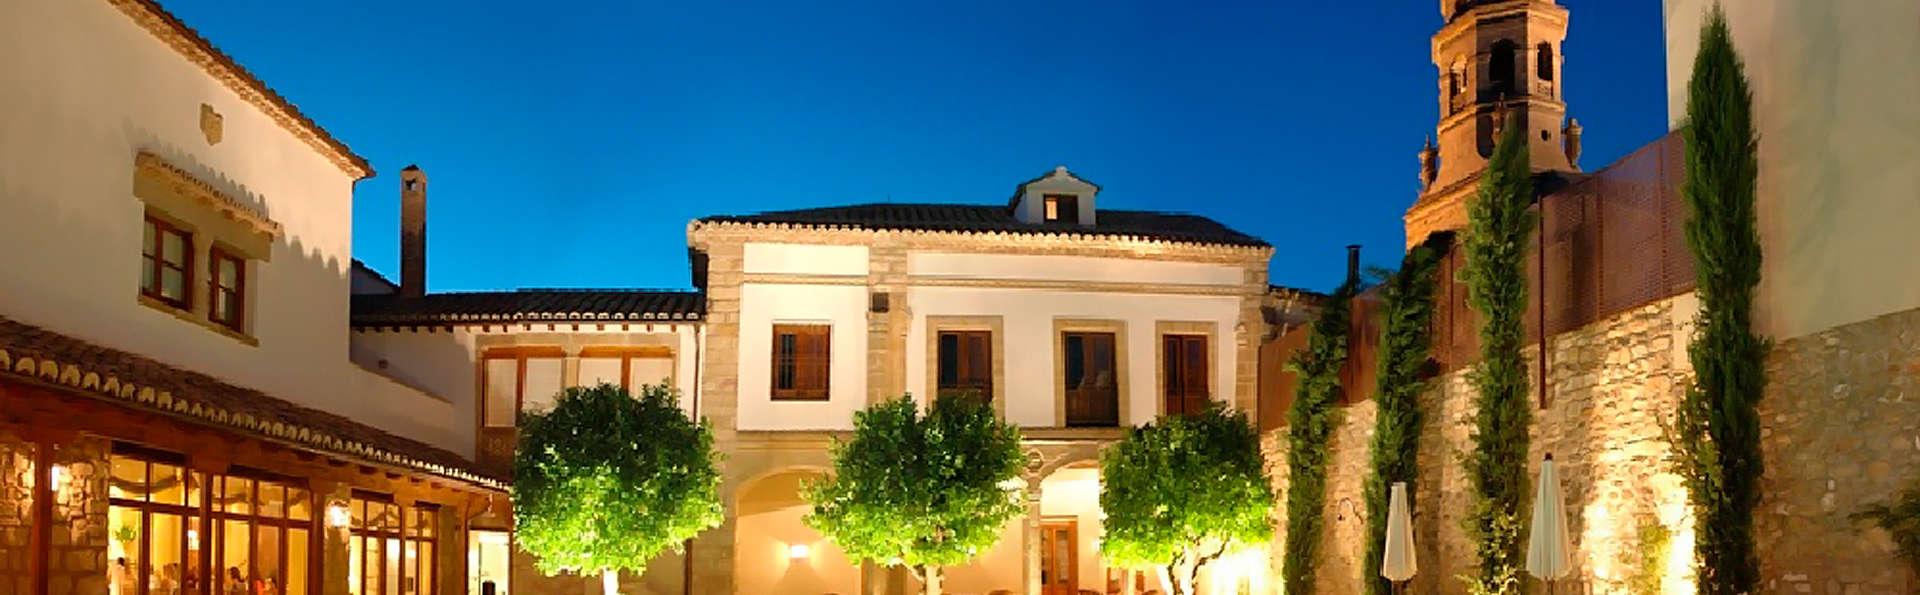 Hotel Puerta de la Luna - edit_front1.jpg